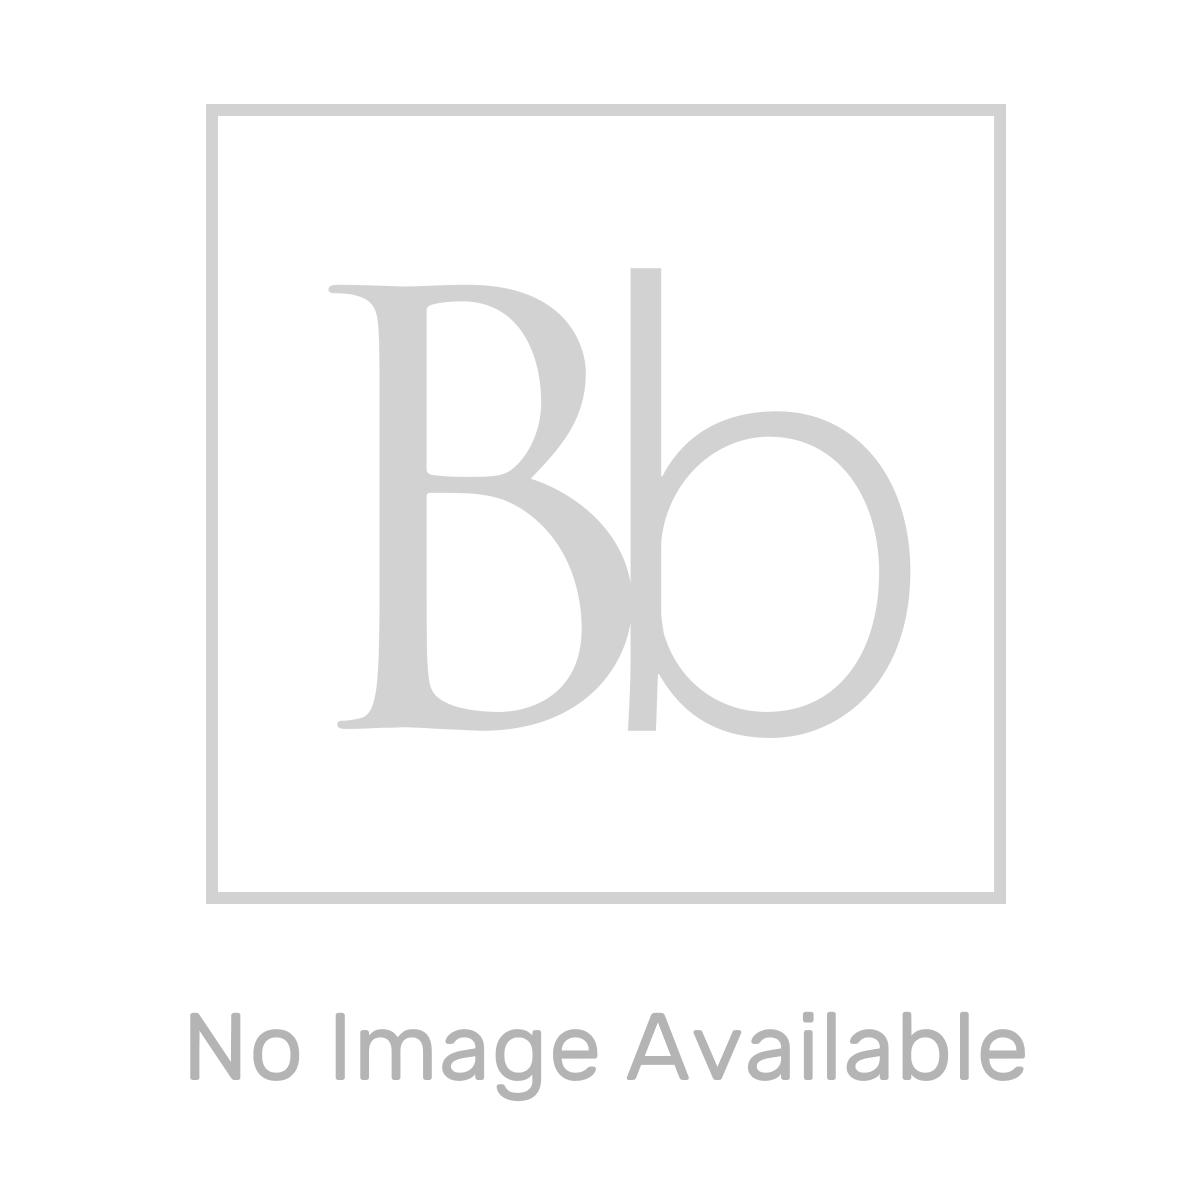 Aquadart Black Slate Shower Tray 1400 x 700